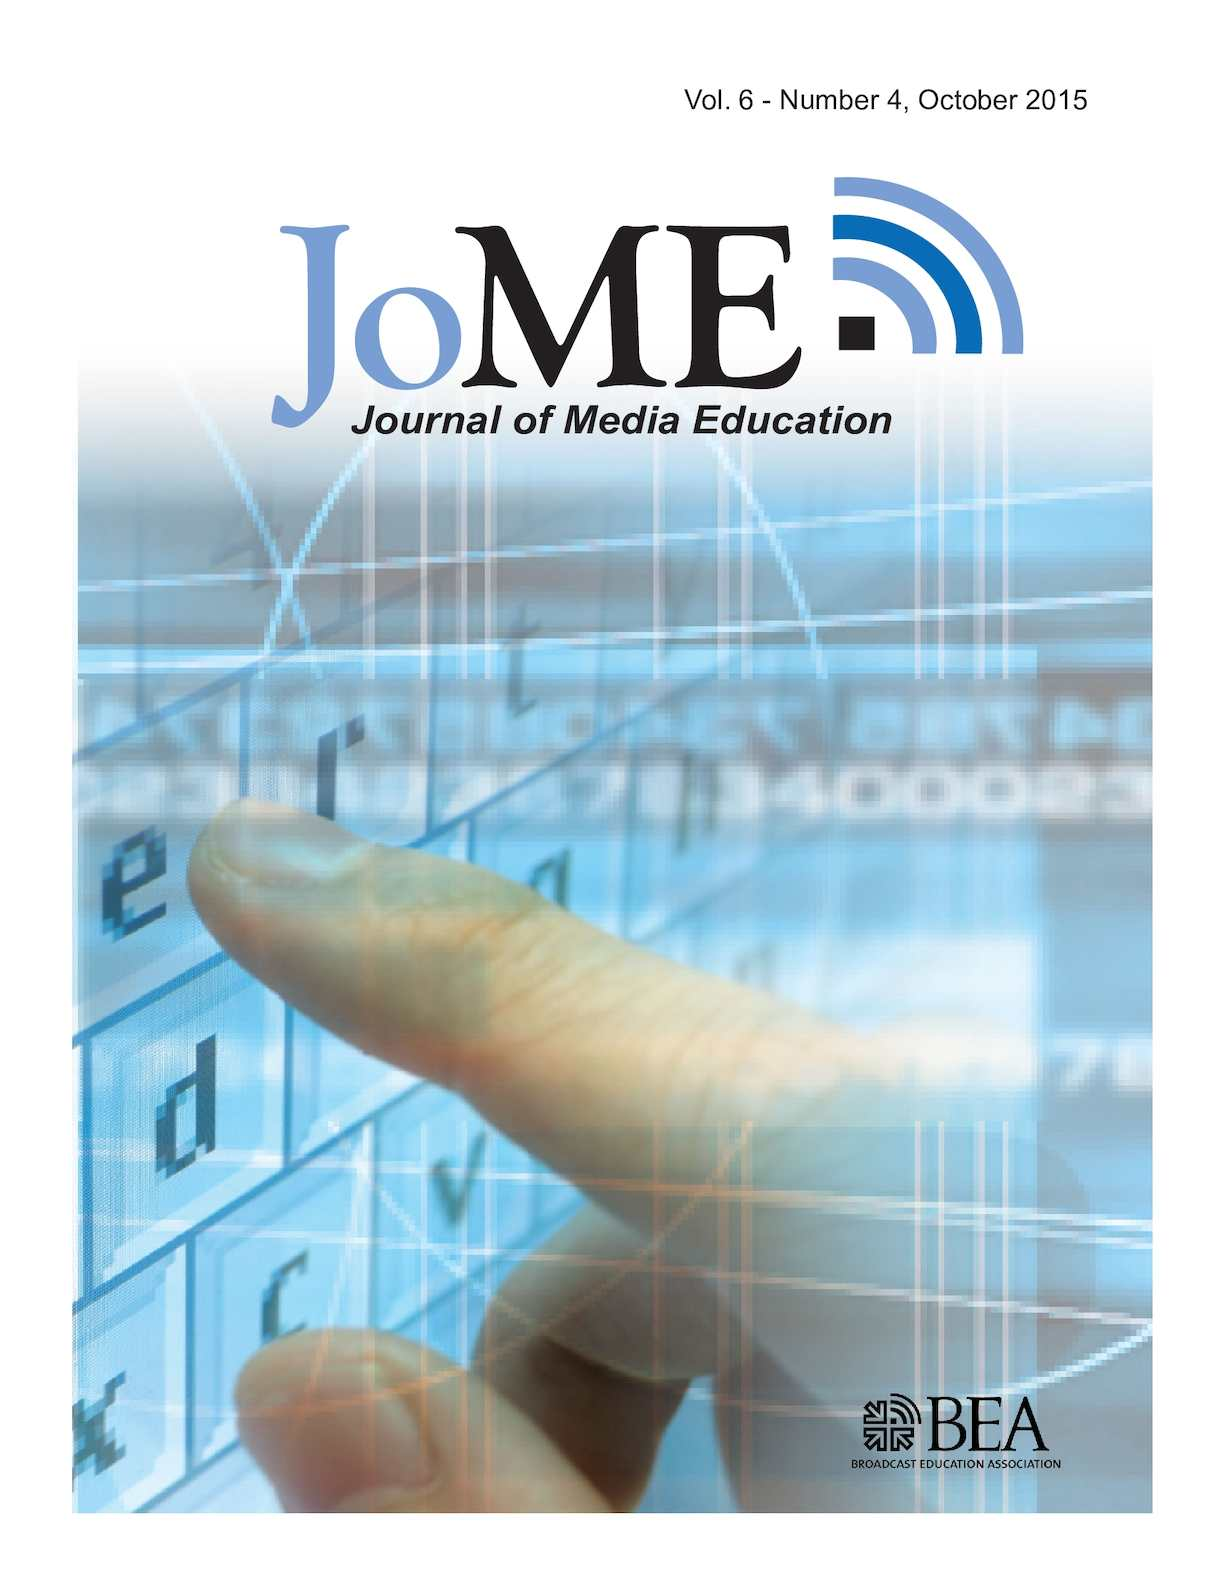 Calaméo - Journal of Media Education   October 2015